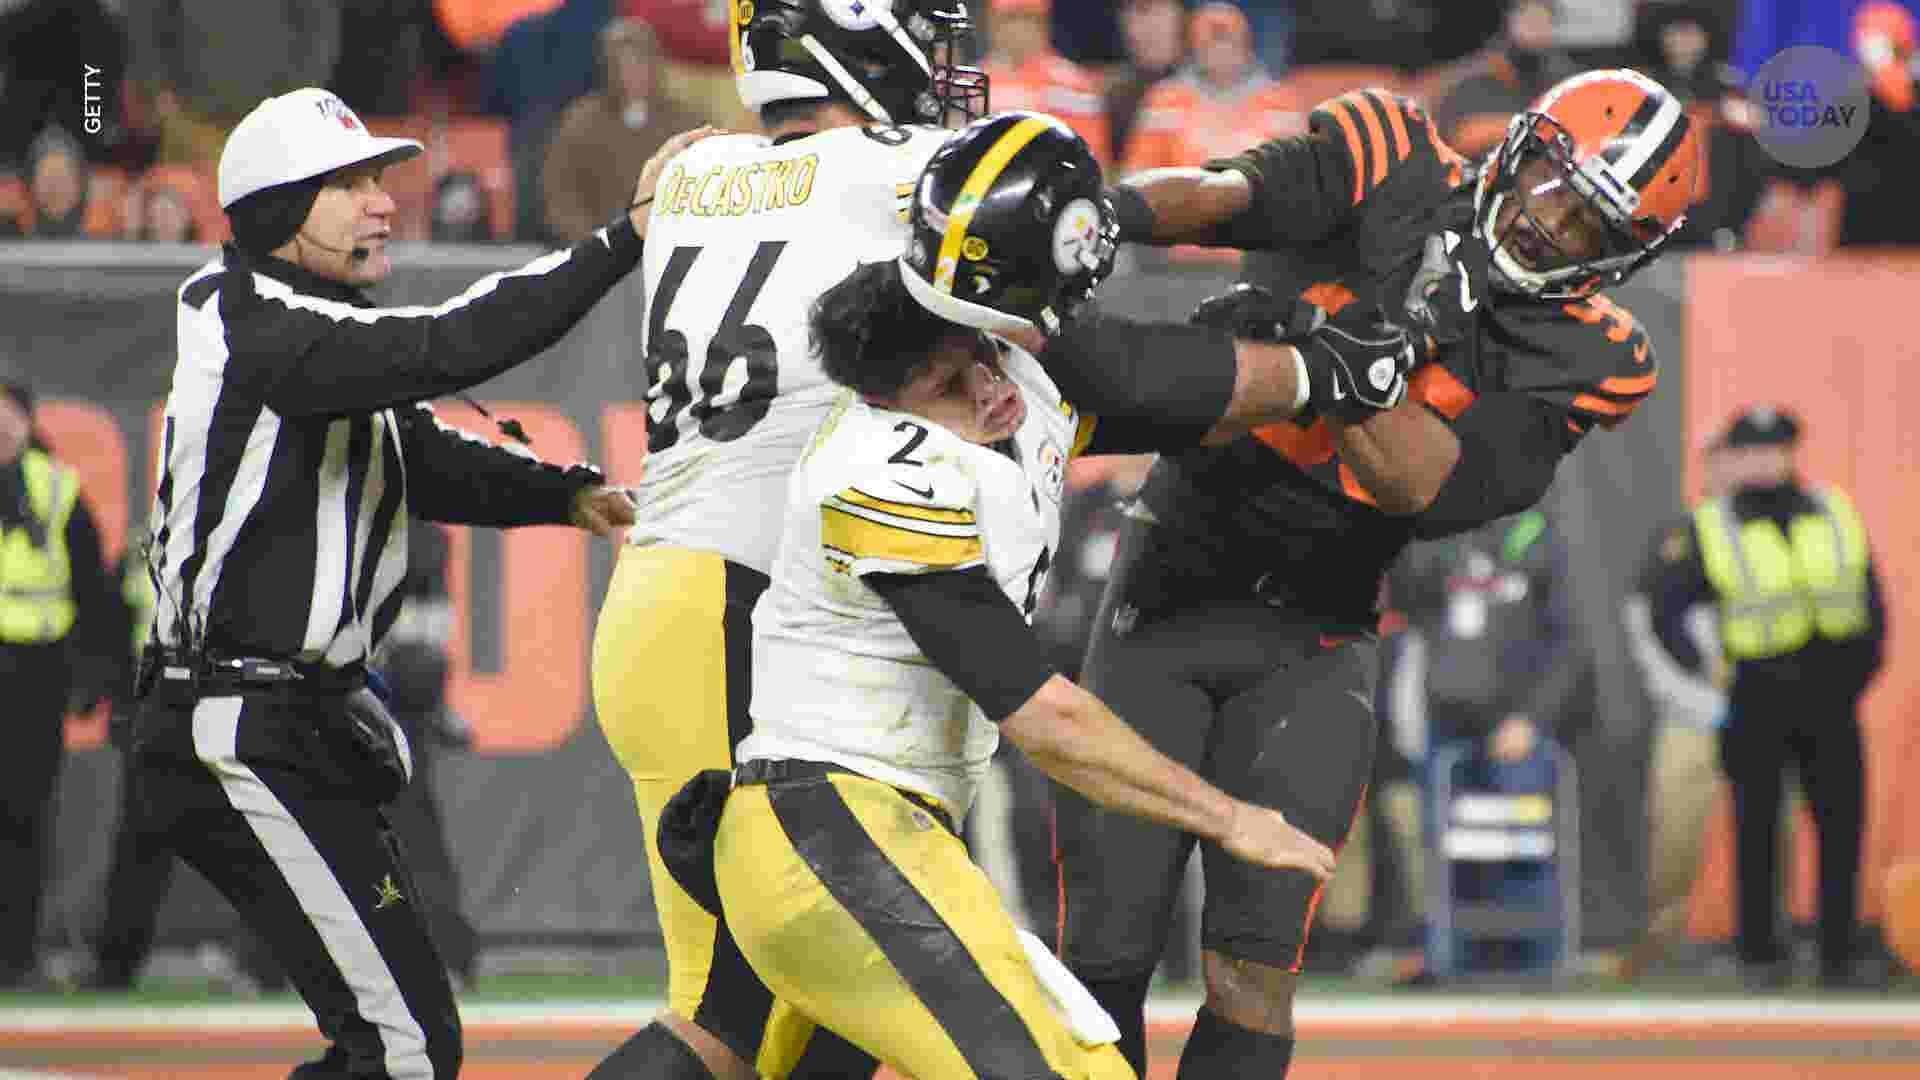 Browns' Myles Garrett, Steelers' Mason Rudolph brawl: NFL reactions